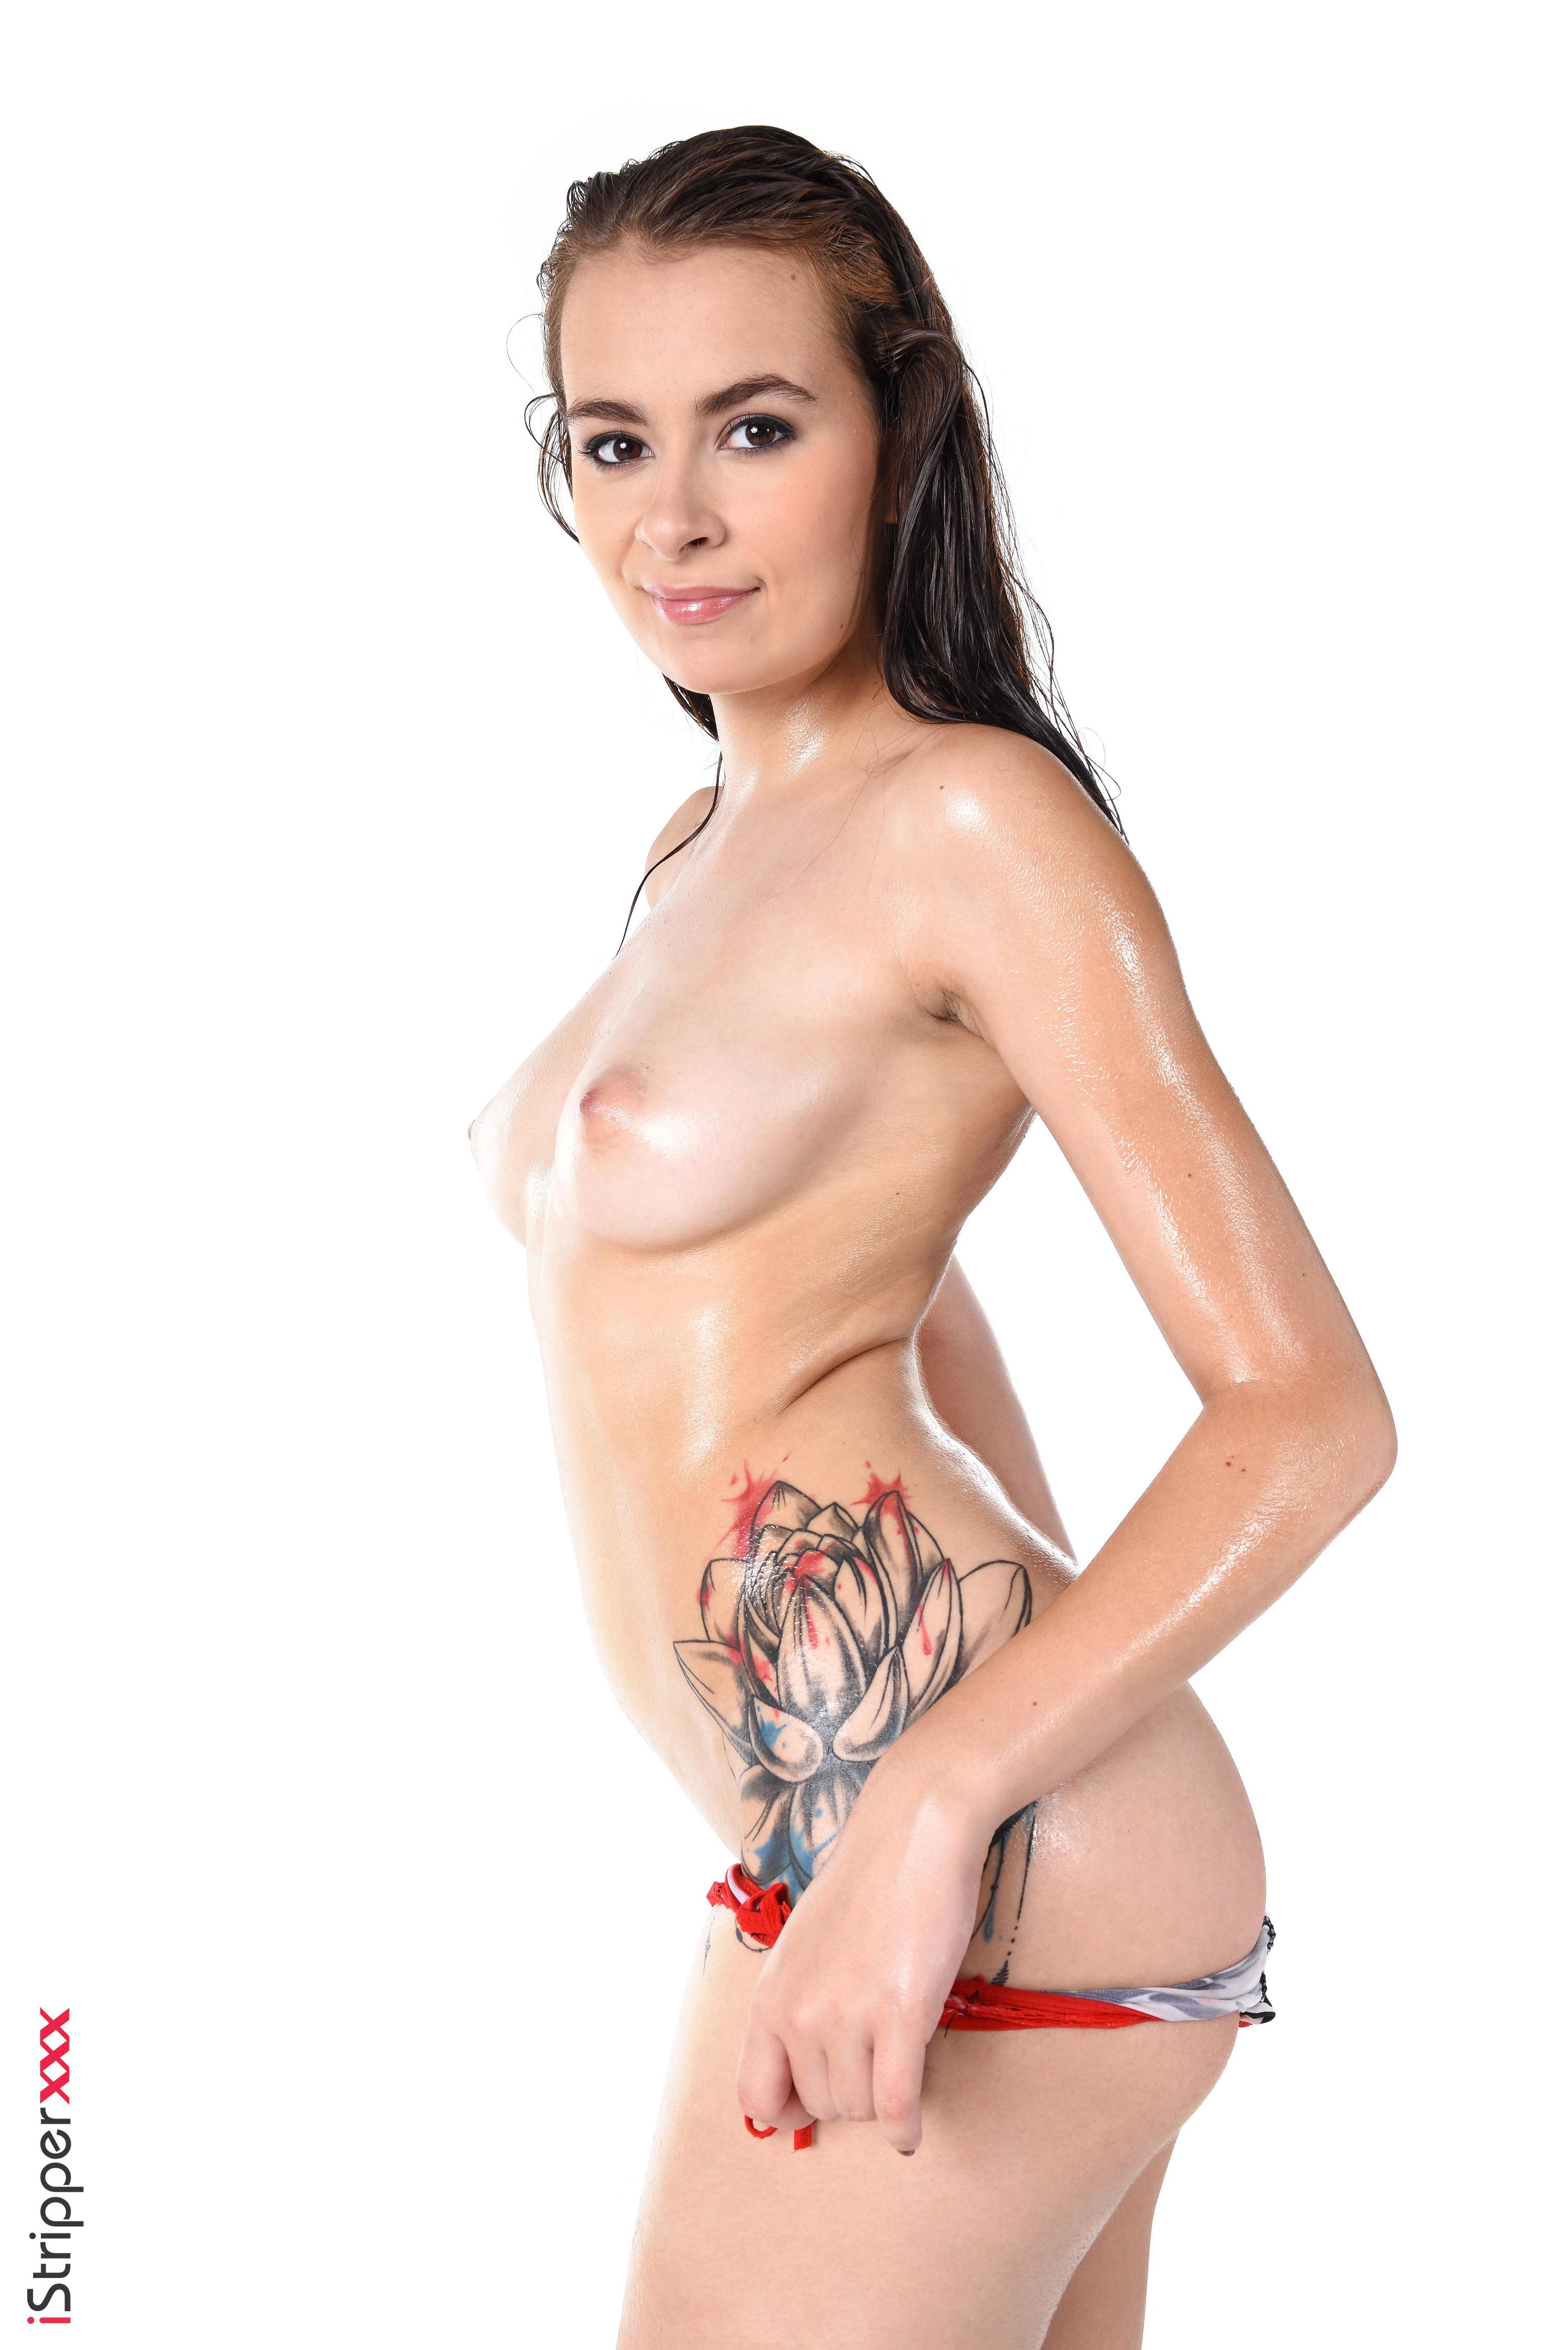 nude Slave female hd wall